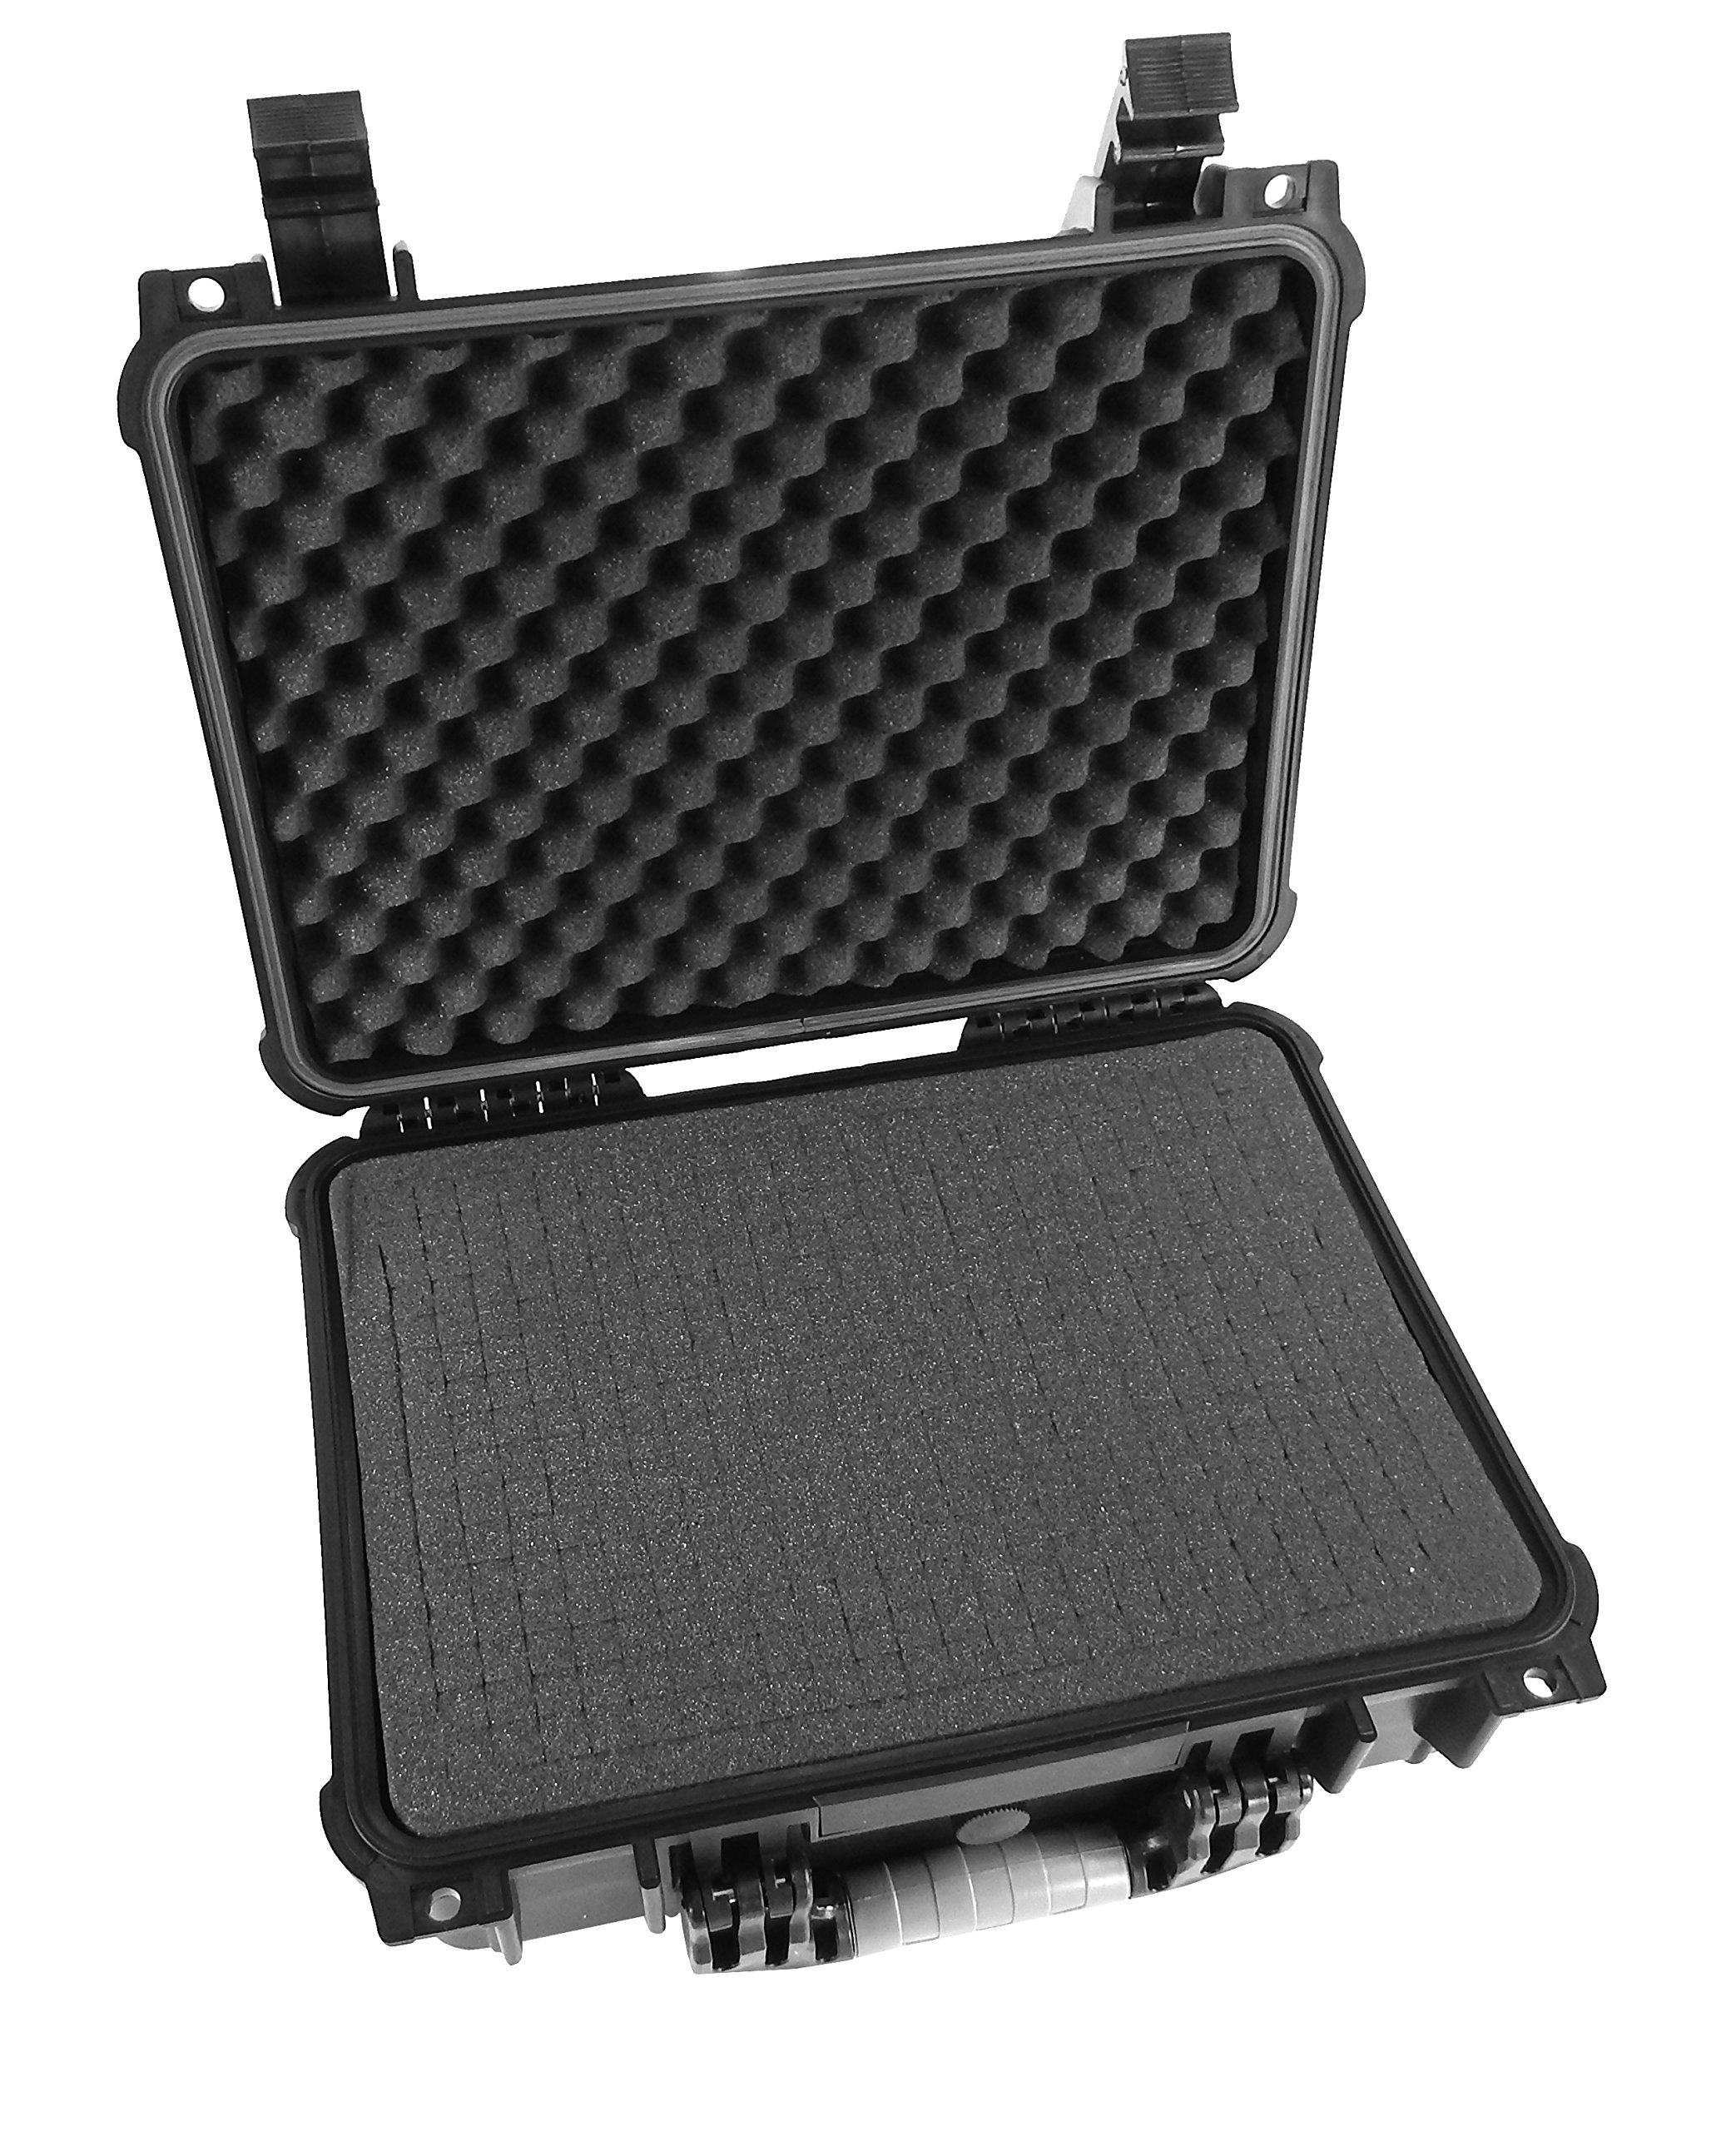 CASEMATIX Armor Travel Carrying Case (16'') for DJ Mixer / Controller - Fits Pioneer DJ CXDJ-700 / DJM-450 / DJM-350 / DDJ-SP1 / RMX-1000 / RMX-500